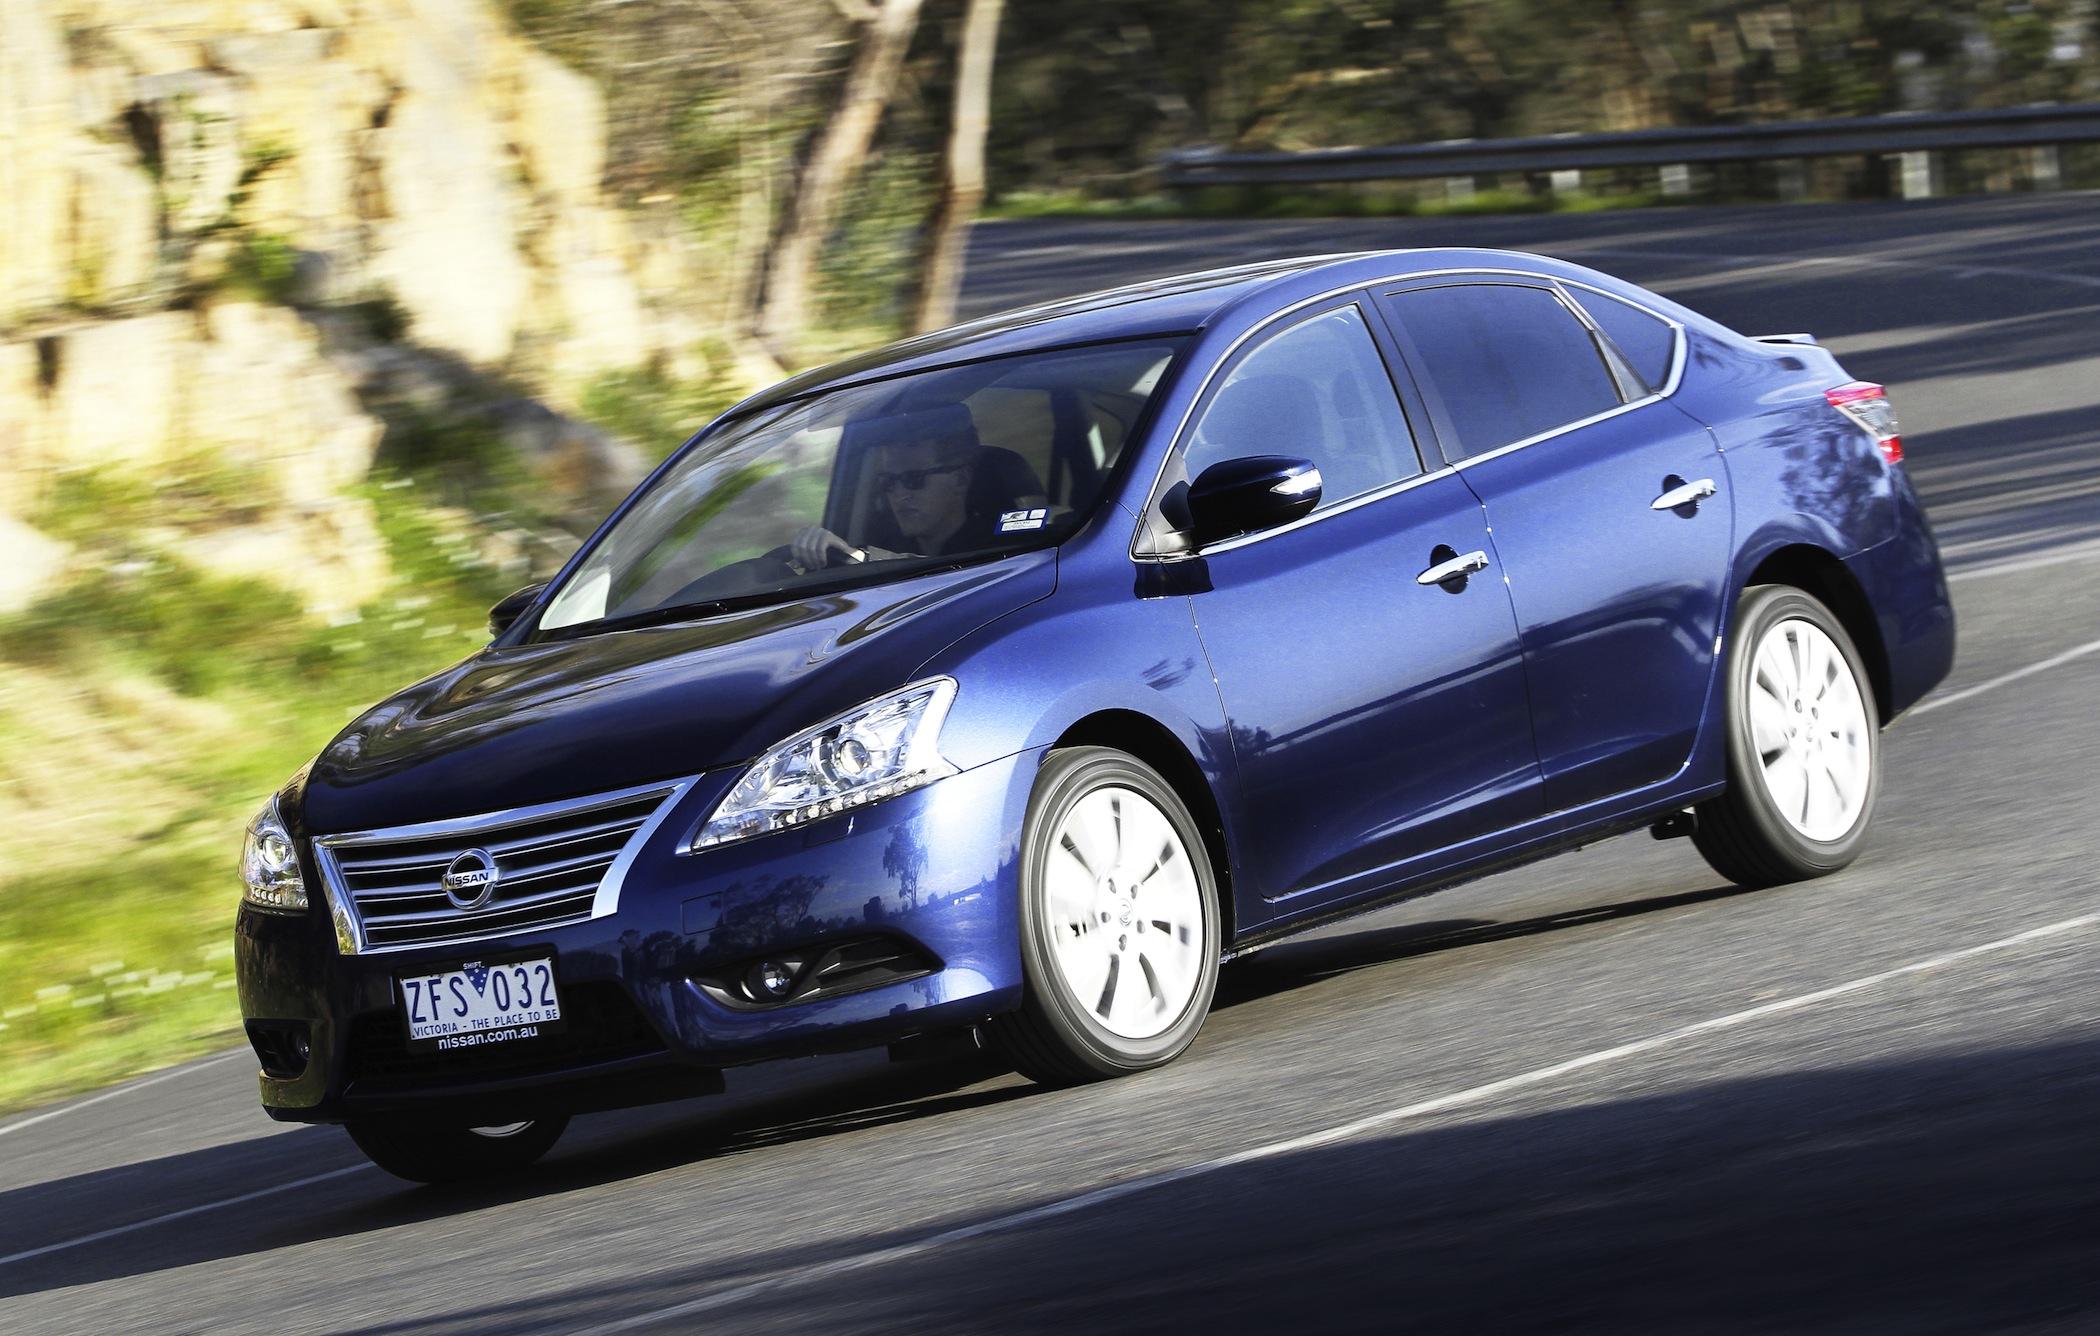 Sedan Automobile: Nissan Pulsar Review - Photos